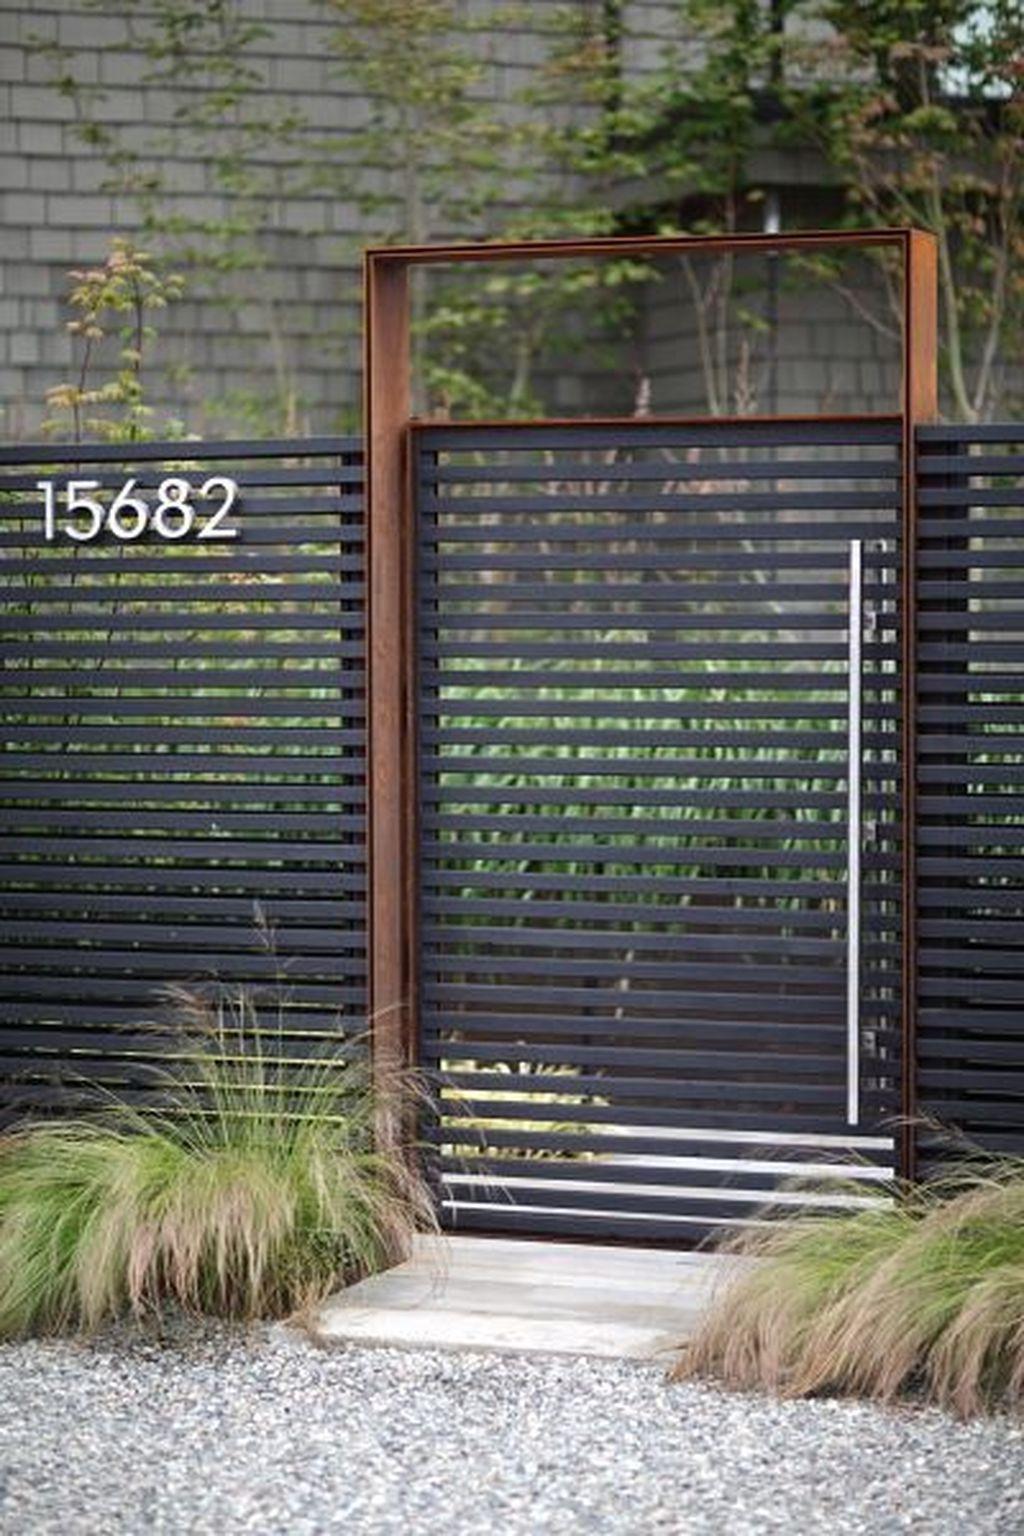 33 Surpising Fence Design Ideas To Enhance Your Beautiful Yard Landschaftsdesign